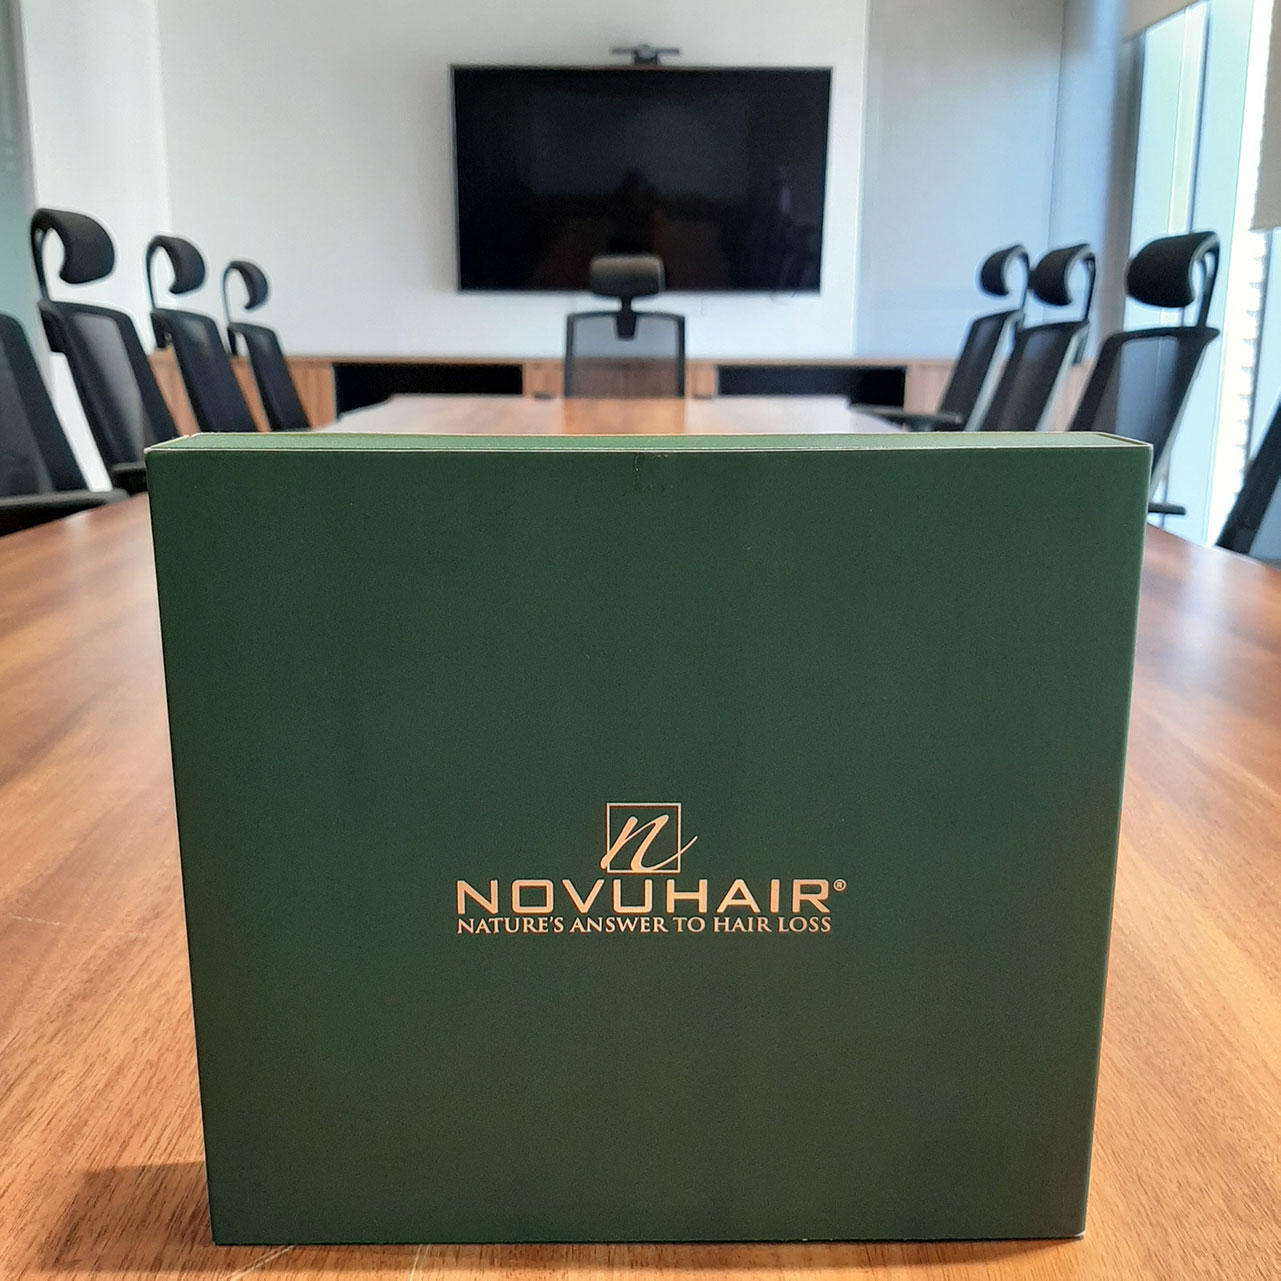 vip novuhair giftbox